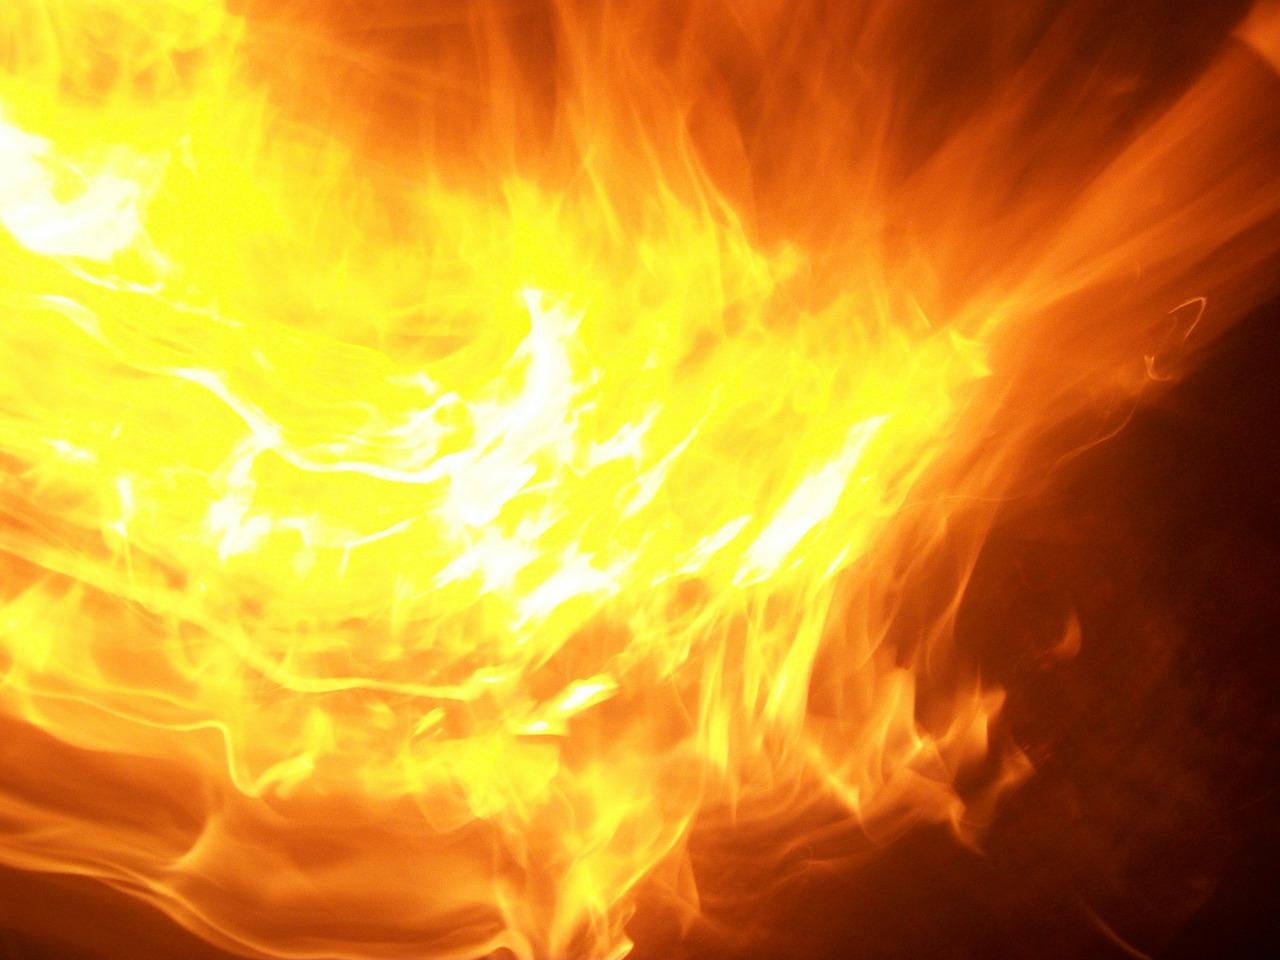 flame-71748_1280